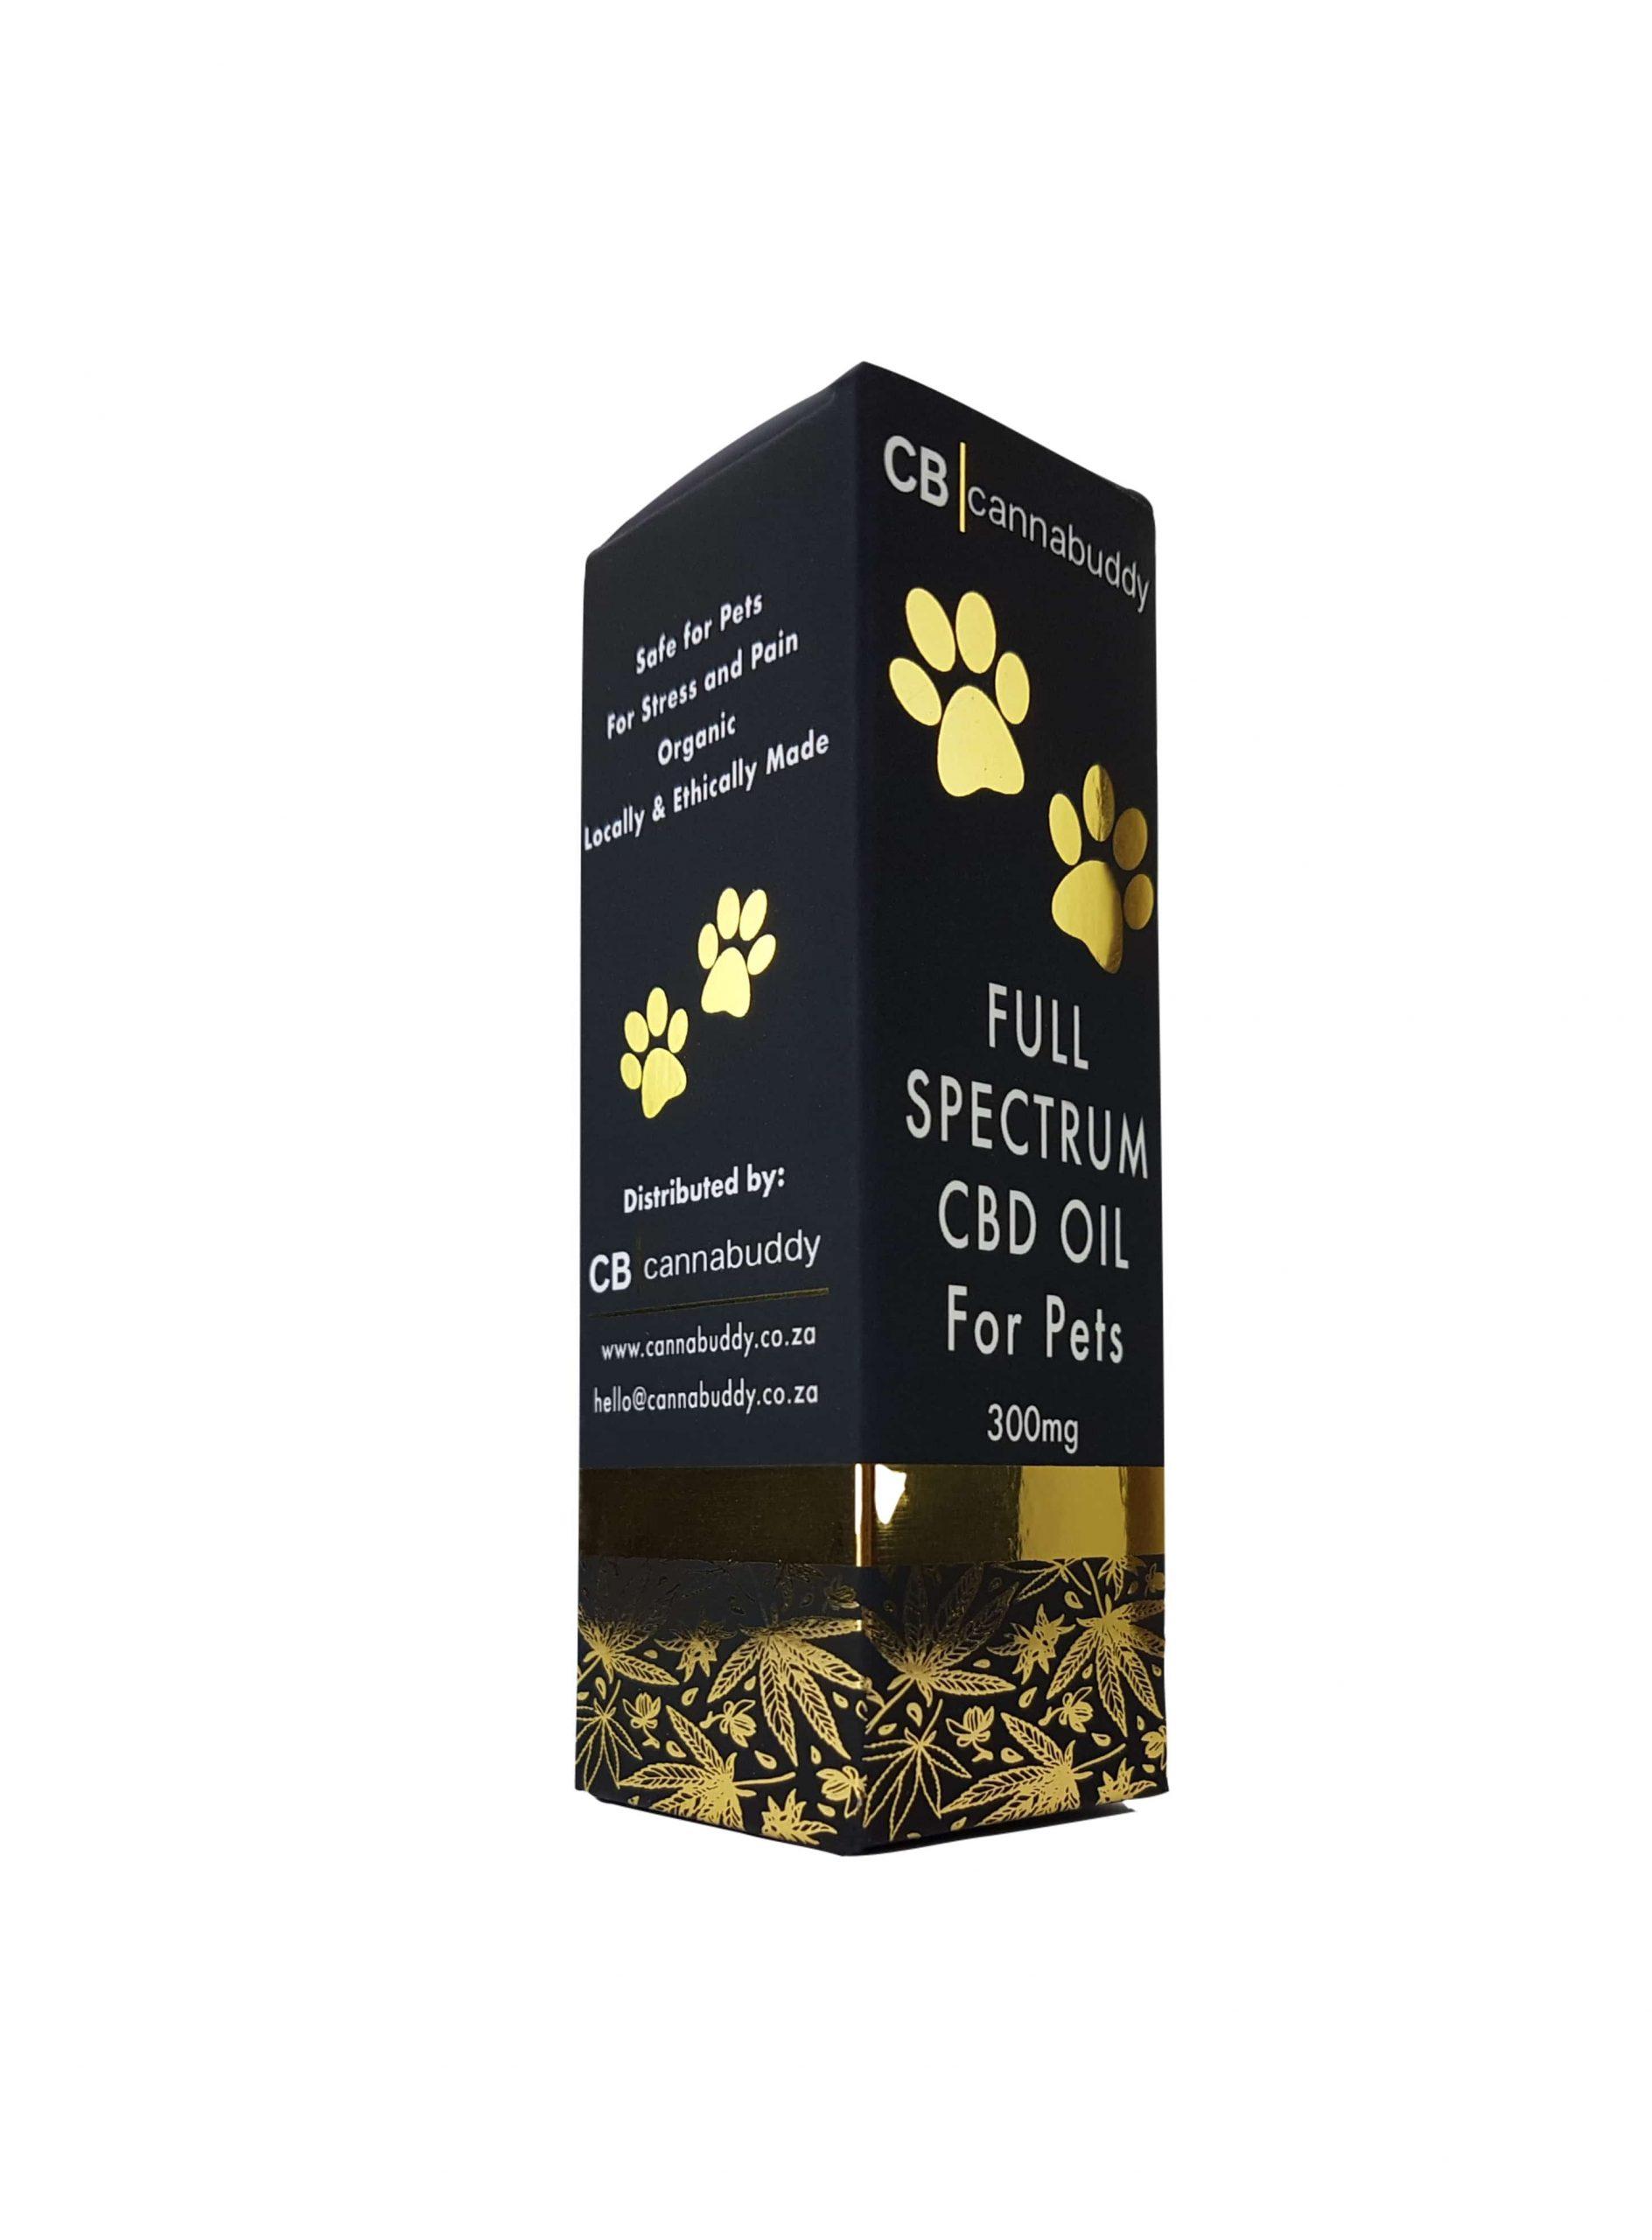 Cannabuddy 300mg Full-Spectrum CBD Oil For Pets